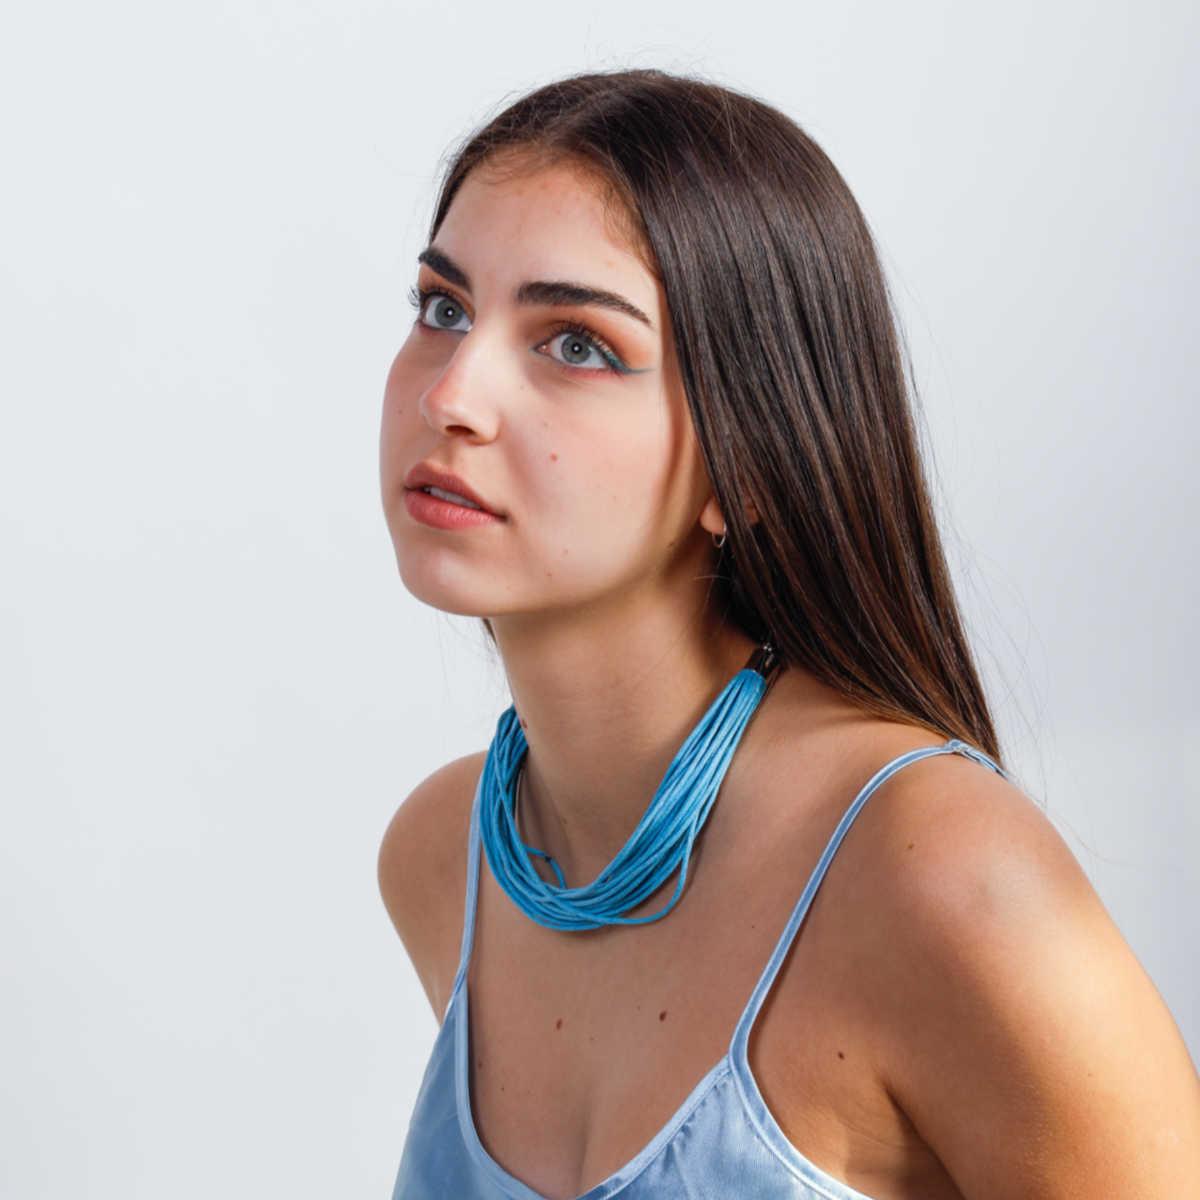 Line-sapphire mehrsträmiger, moderner Schmuck aus Designerhand